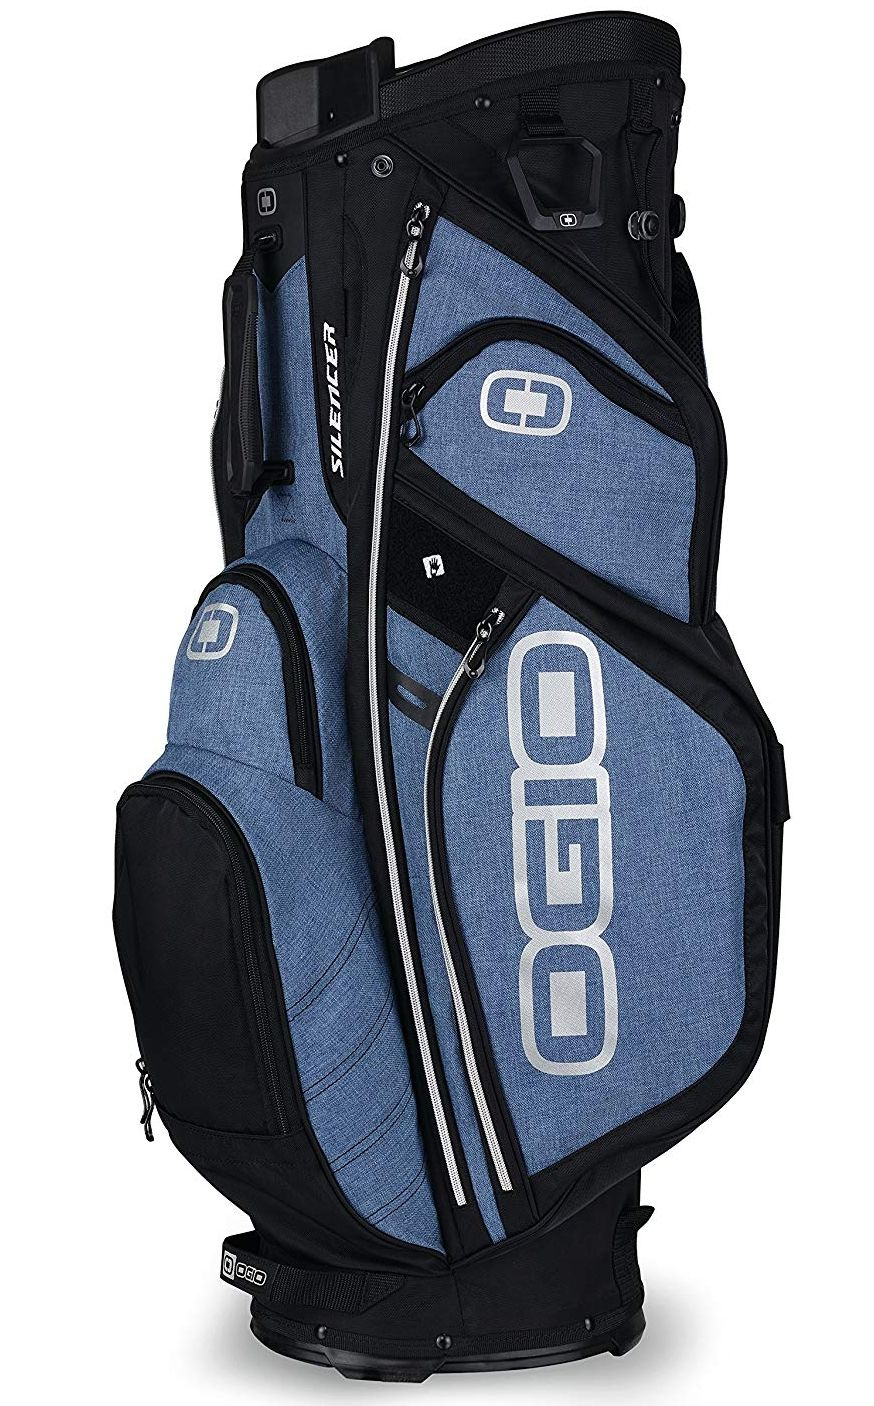 OGIO 2018 Silencer Cart Bag Bags, Silencers, Golf bags